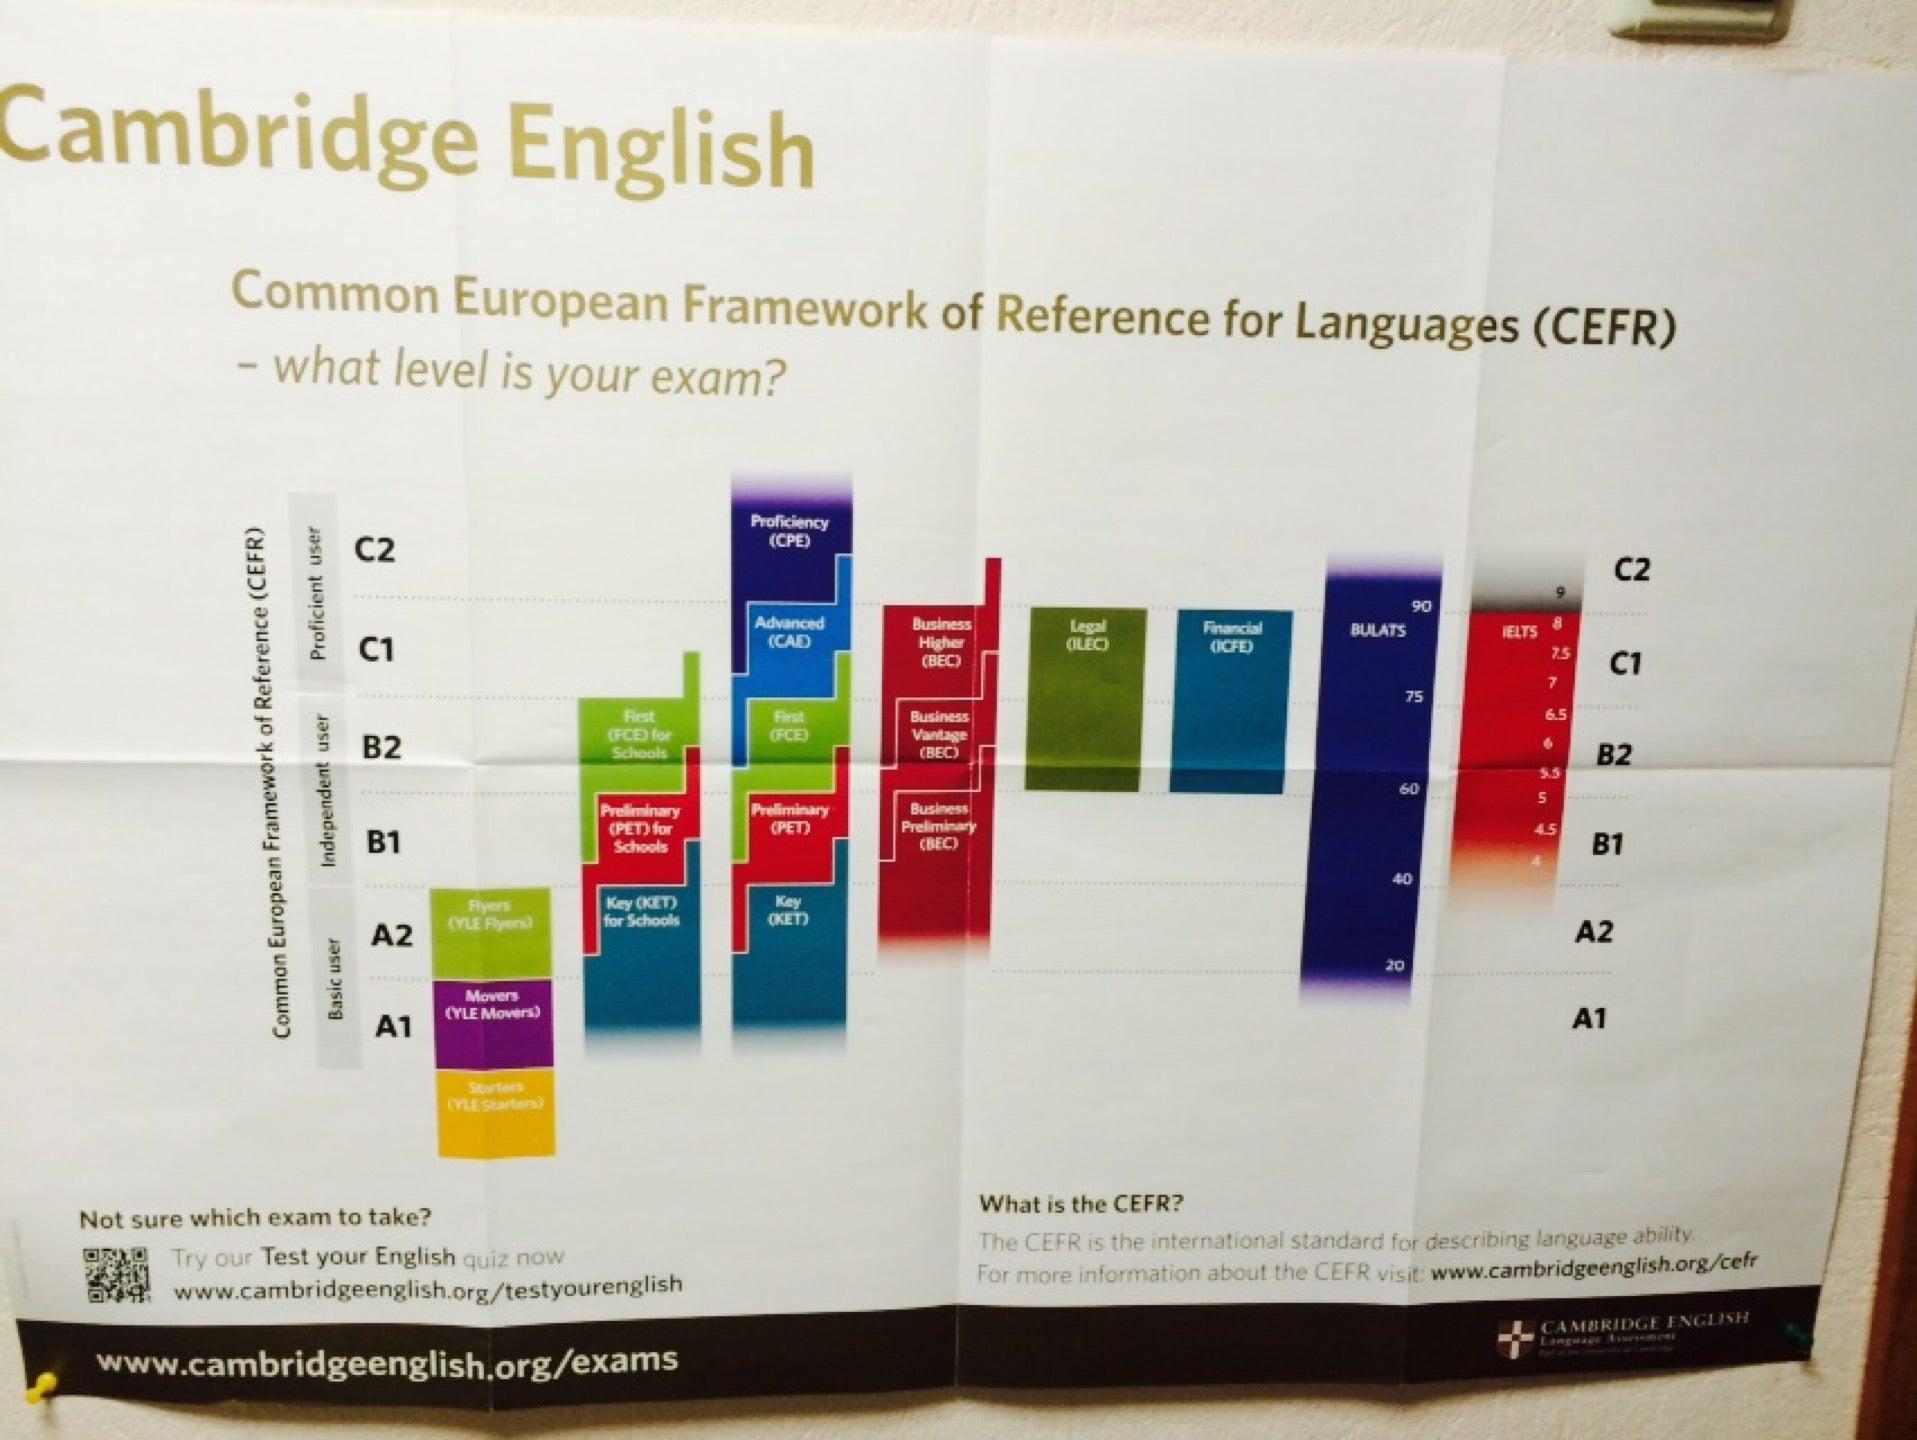 common european framework of reference for